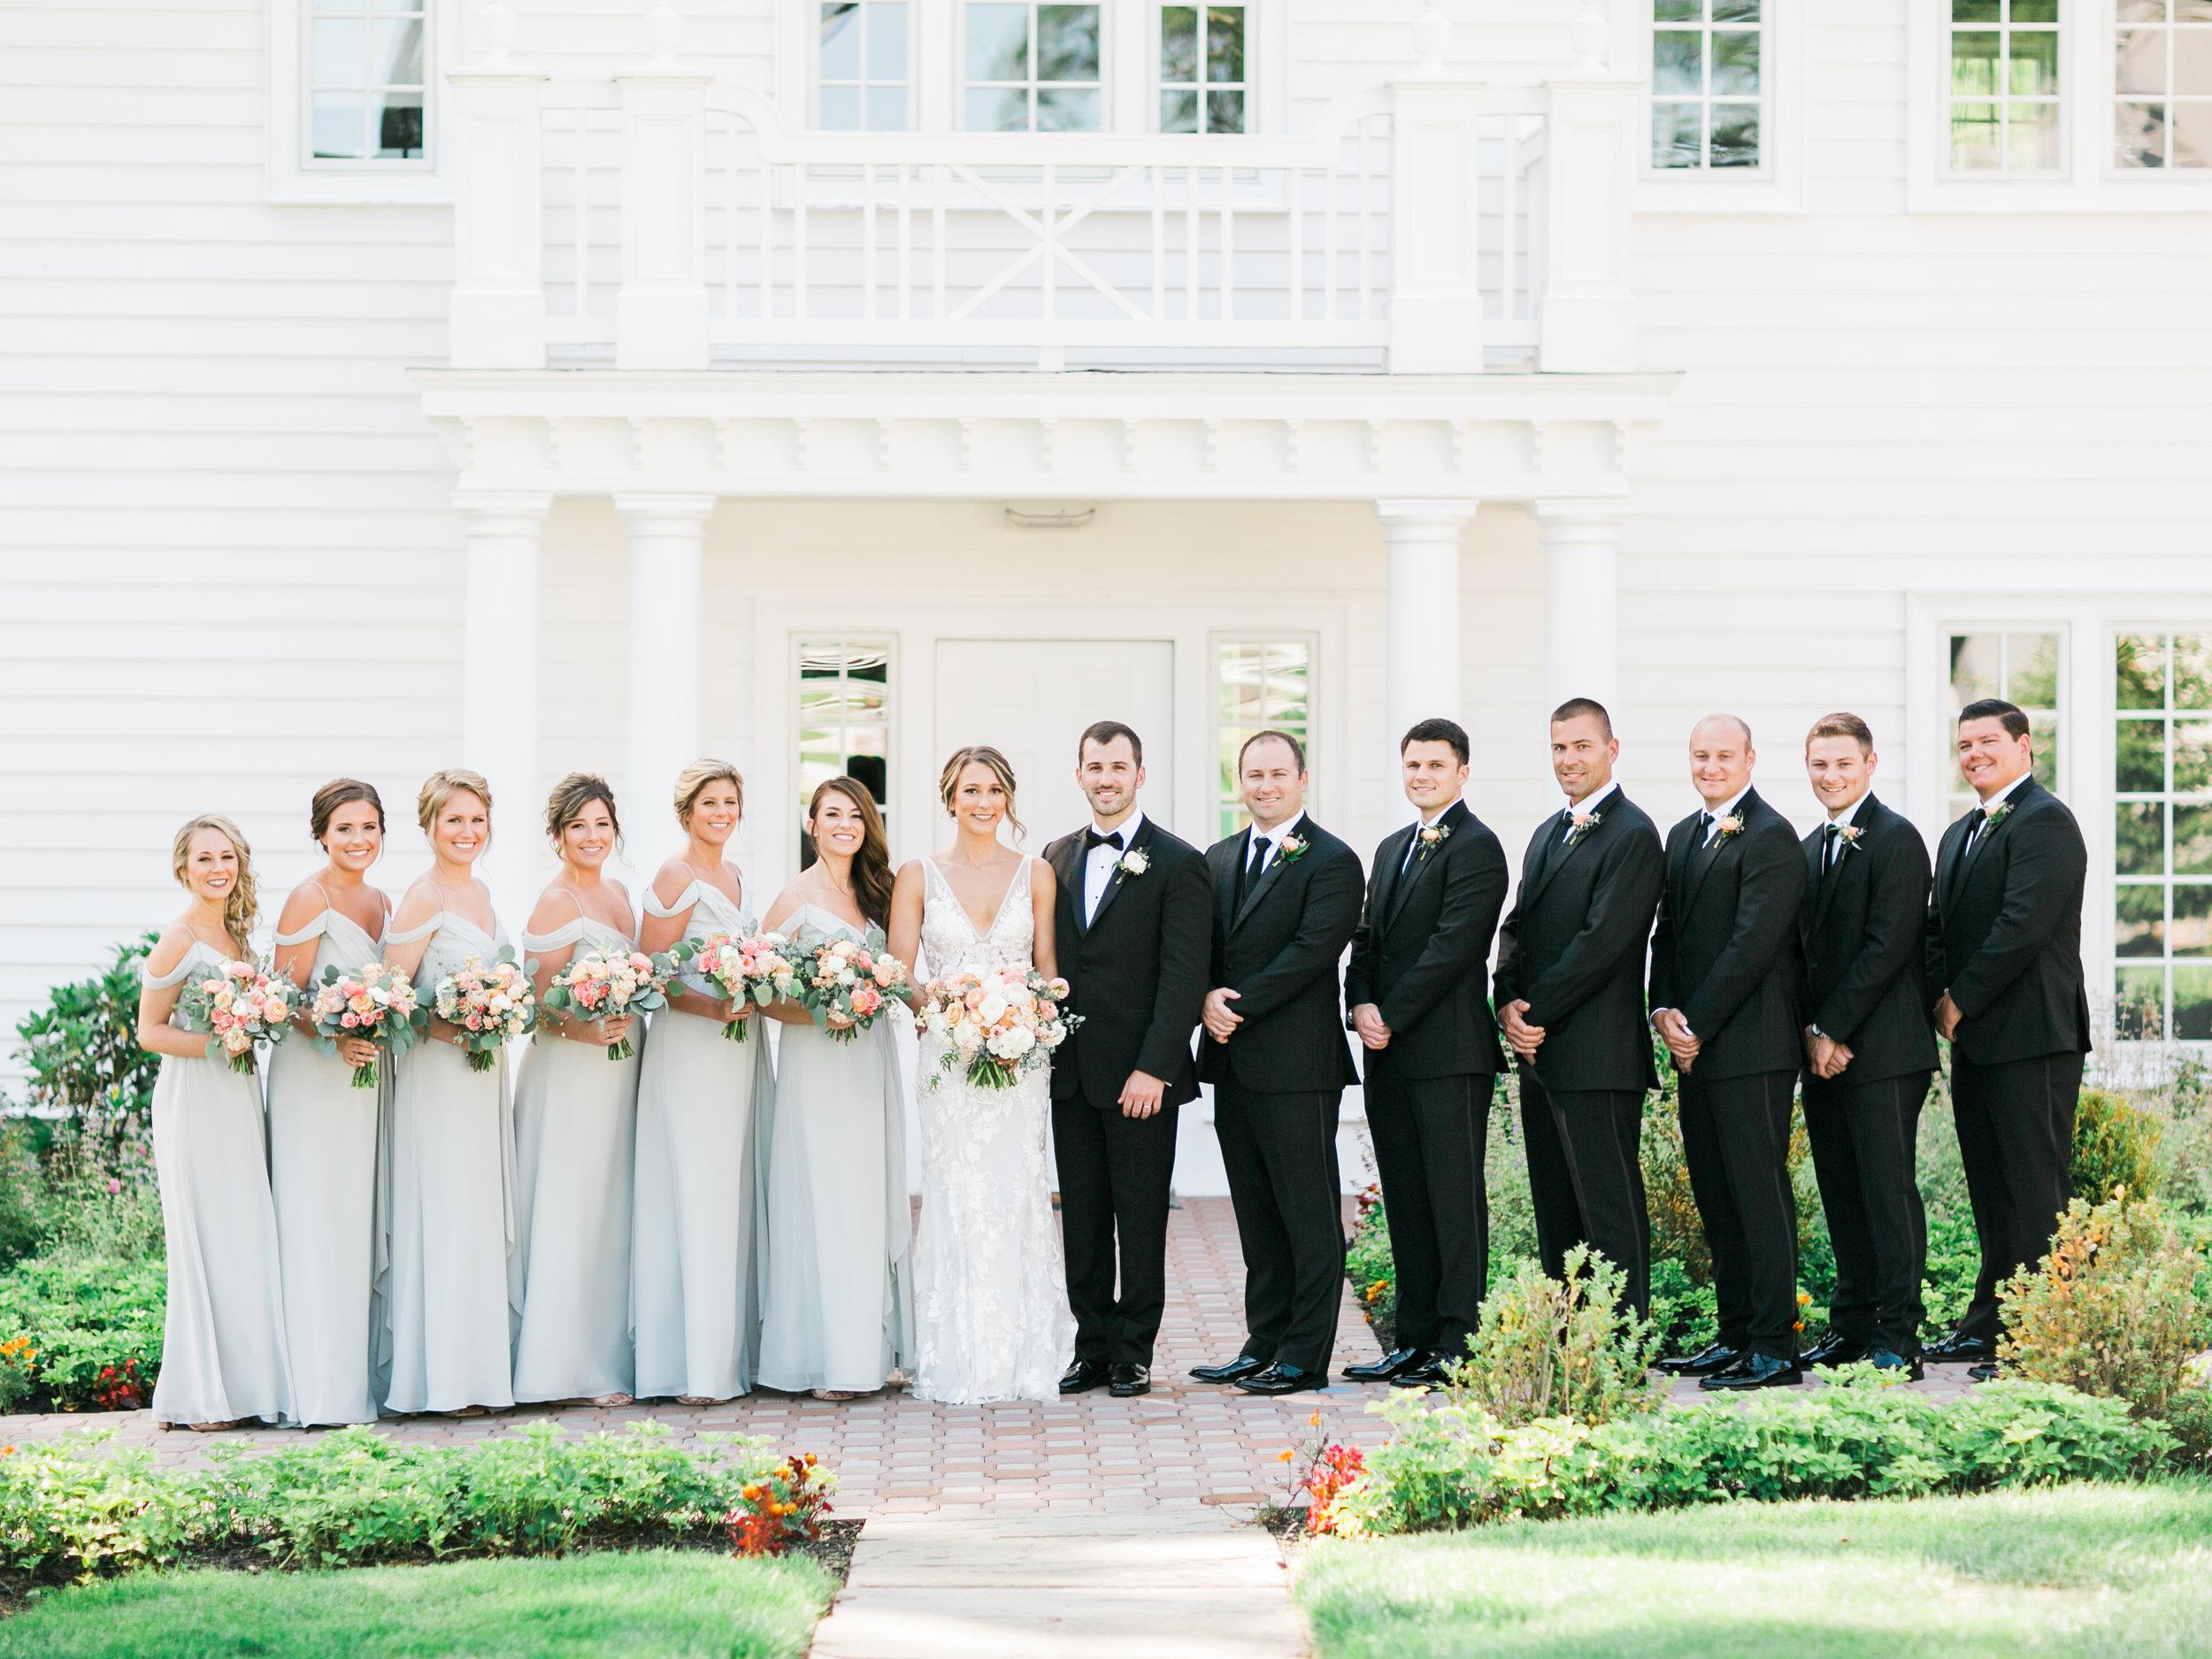 ryland-inn-wedding-AG-00401.jpg